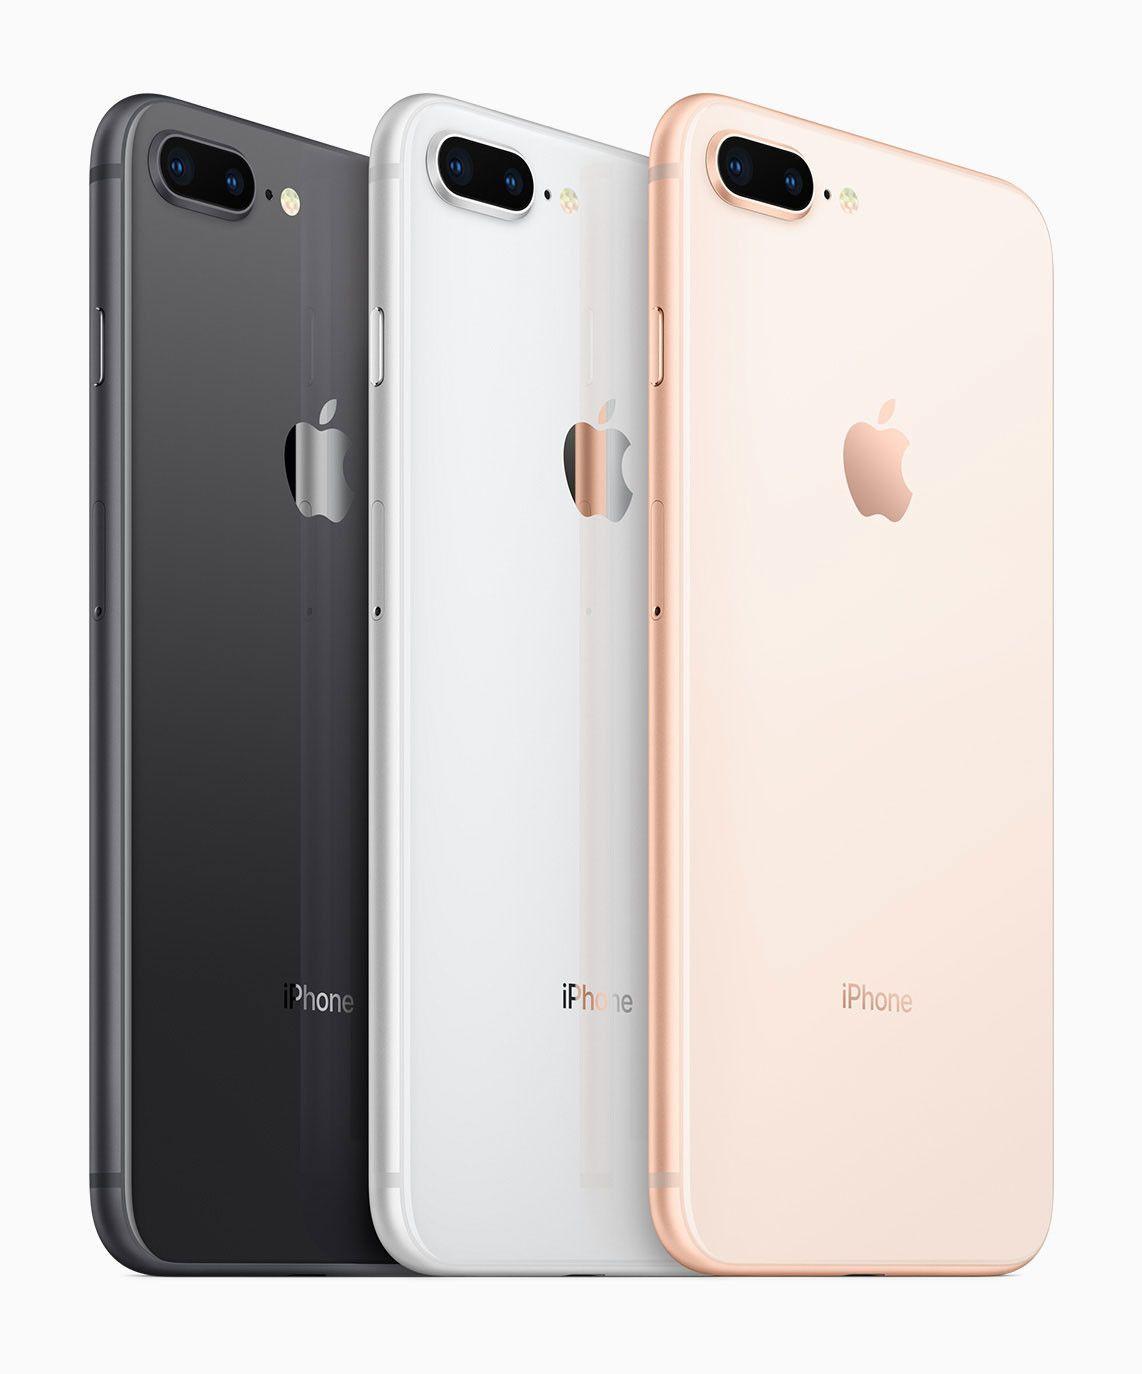 Iphone 8 8 Plus Modelos Iphone8plus Iphone Apple Iphone New Iphone 8